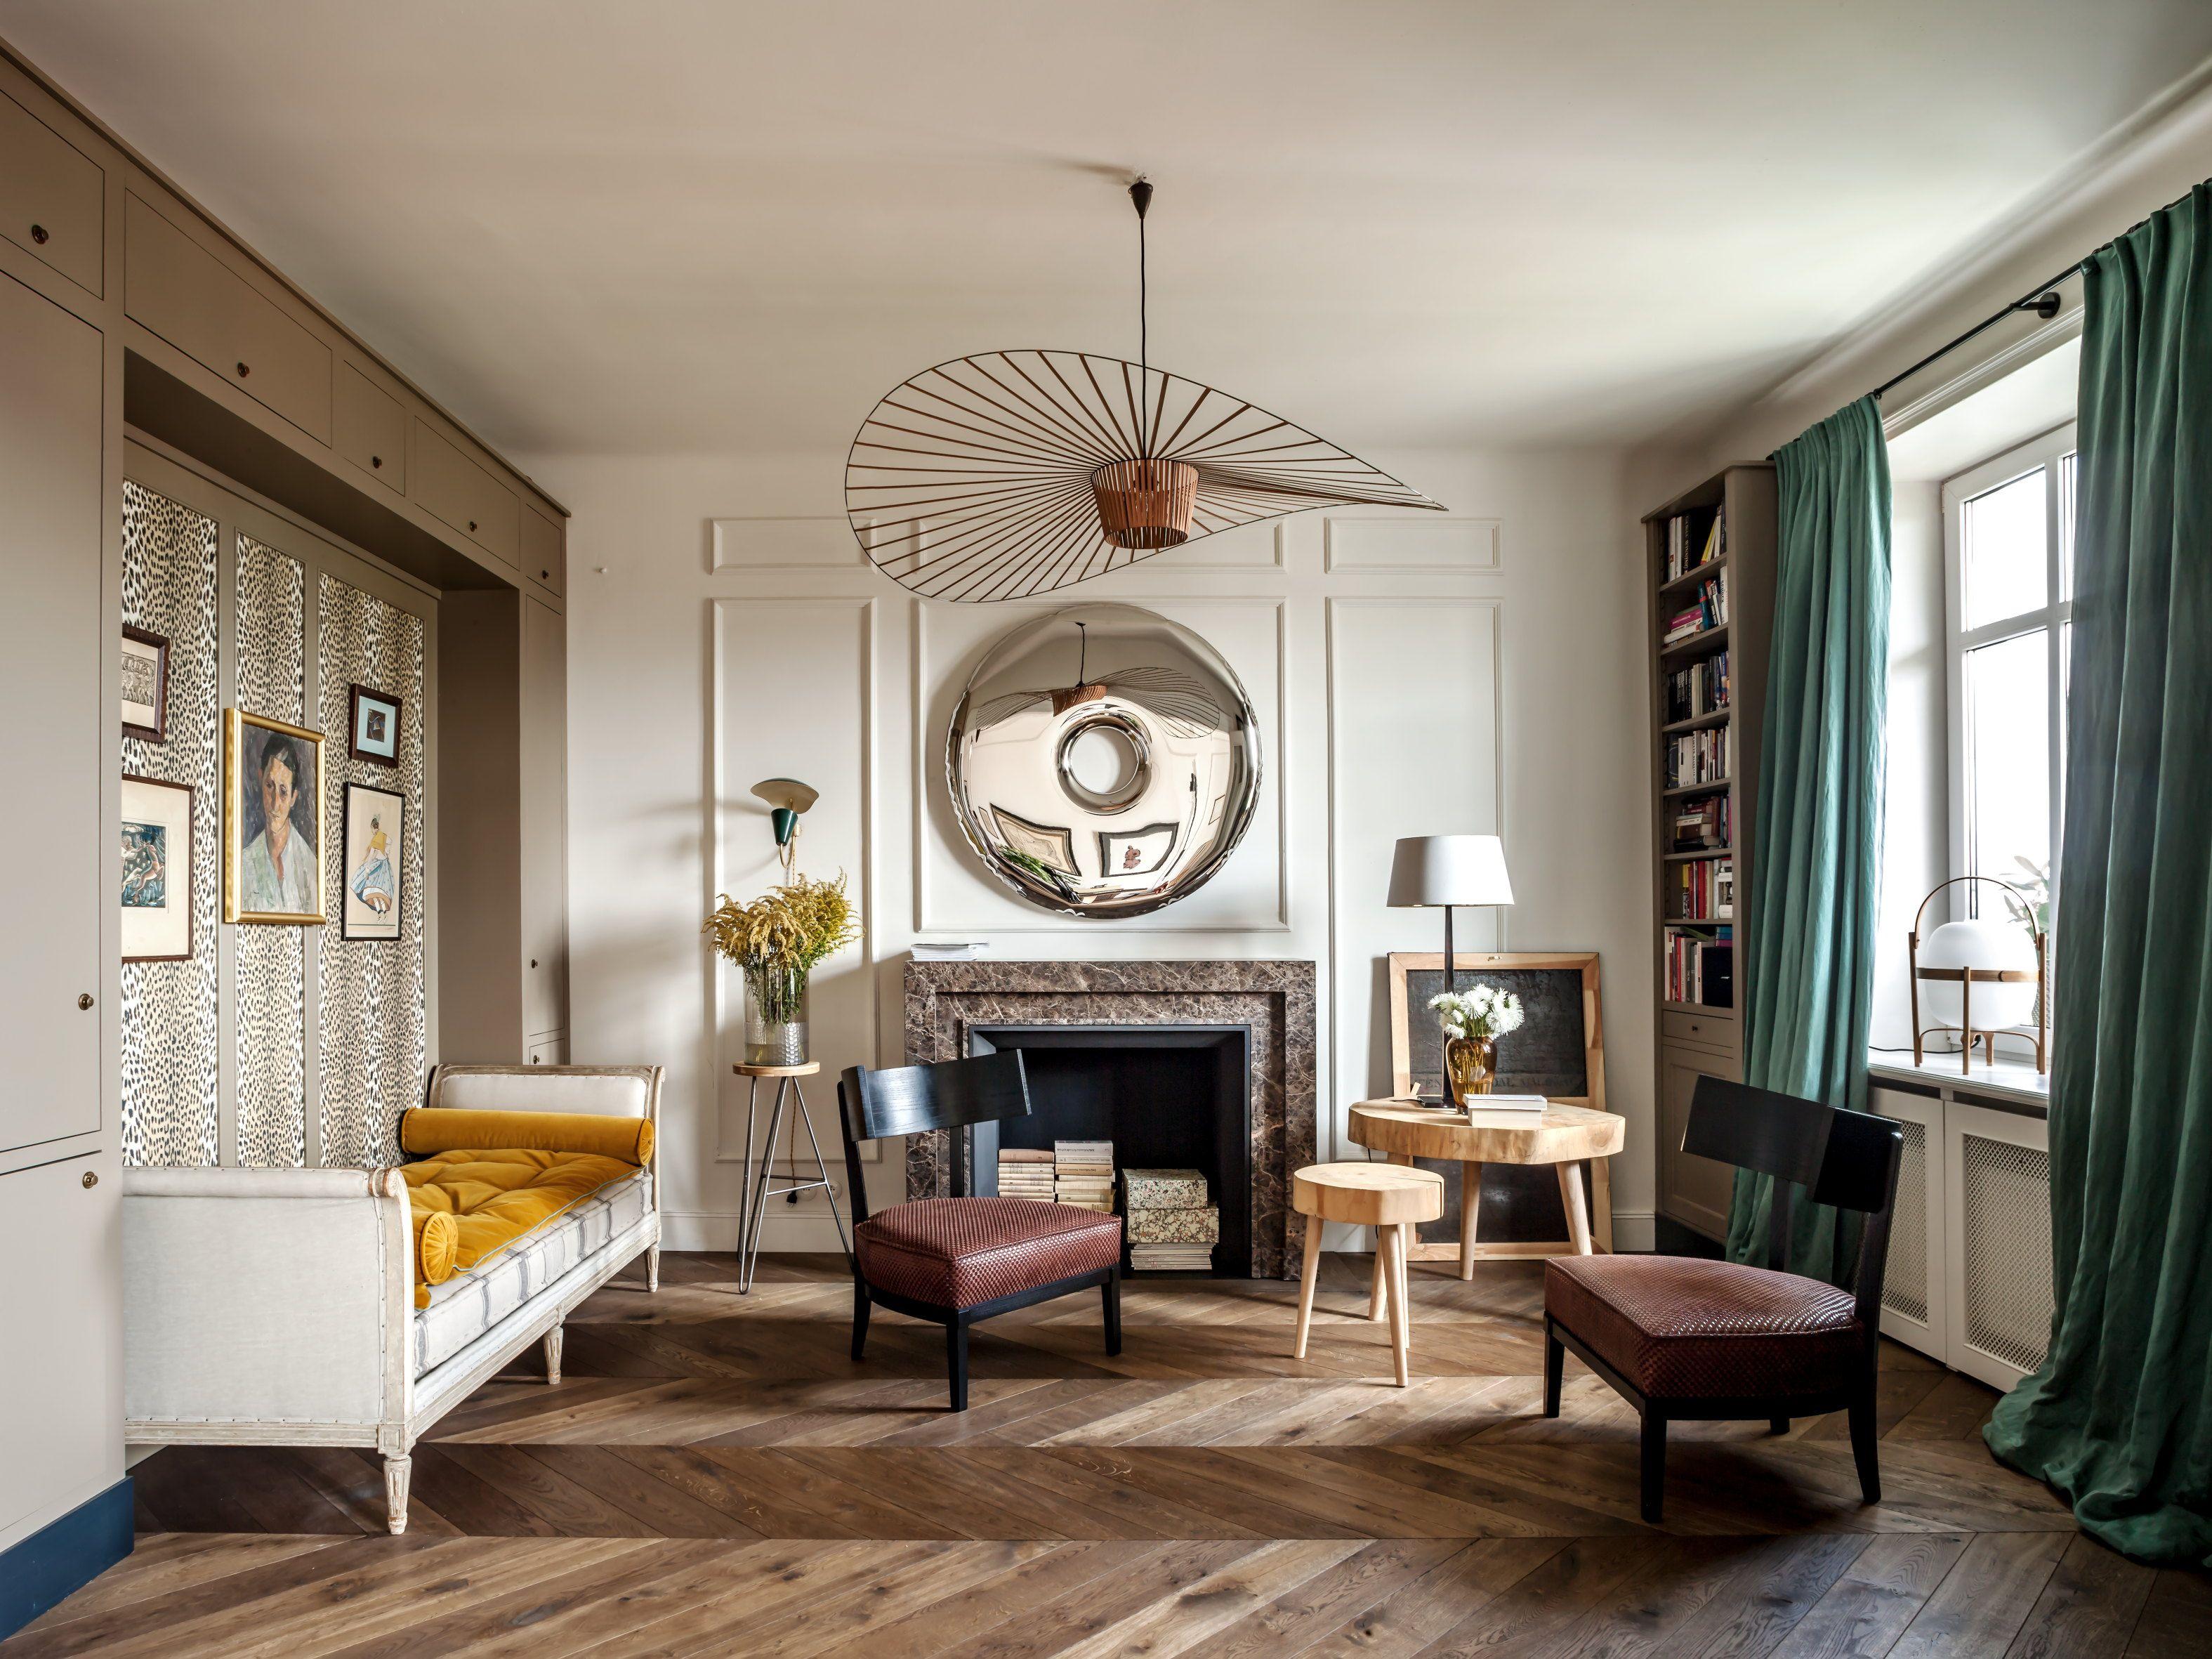 Oskar Zieta Mirror  Willowa Interior  Pinterest  Interiors Stunning Interior Design Photos Living Room 2018